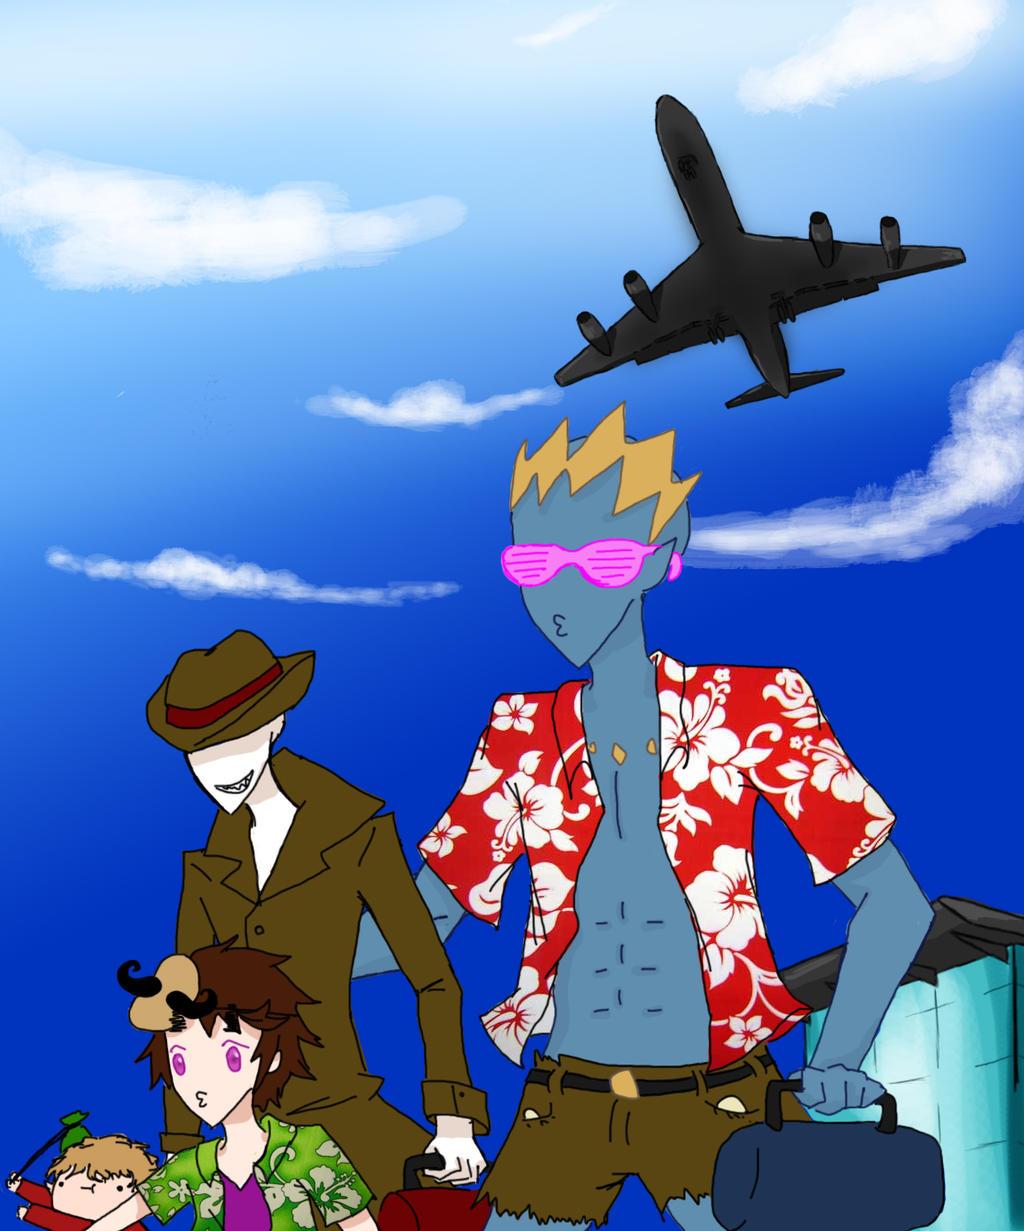 We're off to America by SeniorPotato on DeviantArt